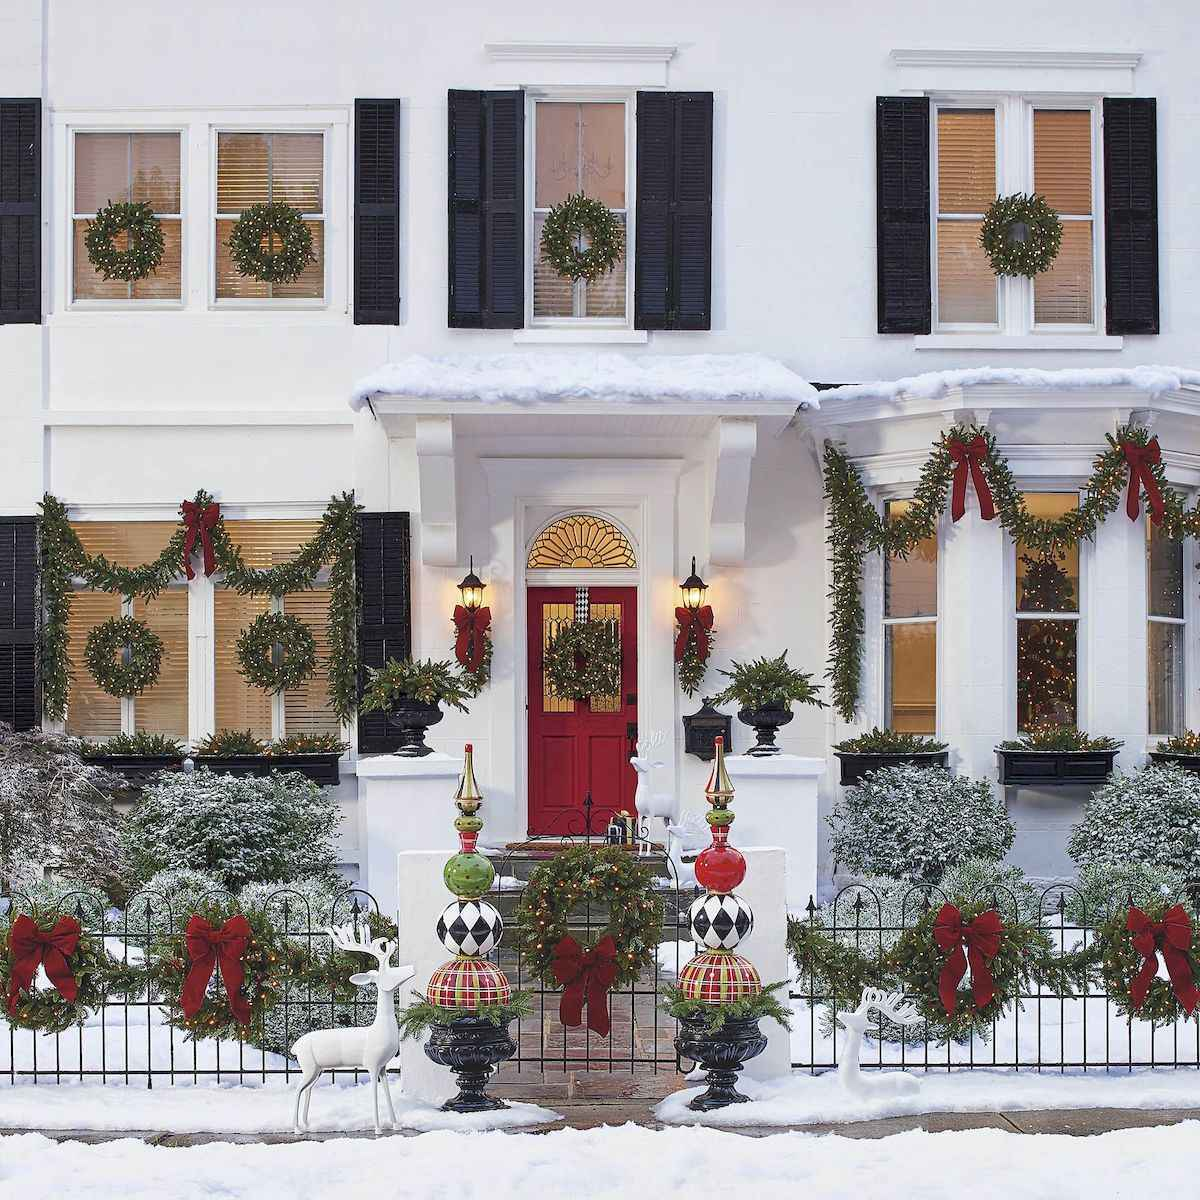 40 amazing outdoor christmas decorations ideas (30)